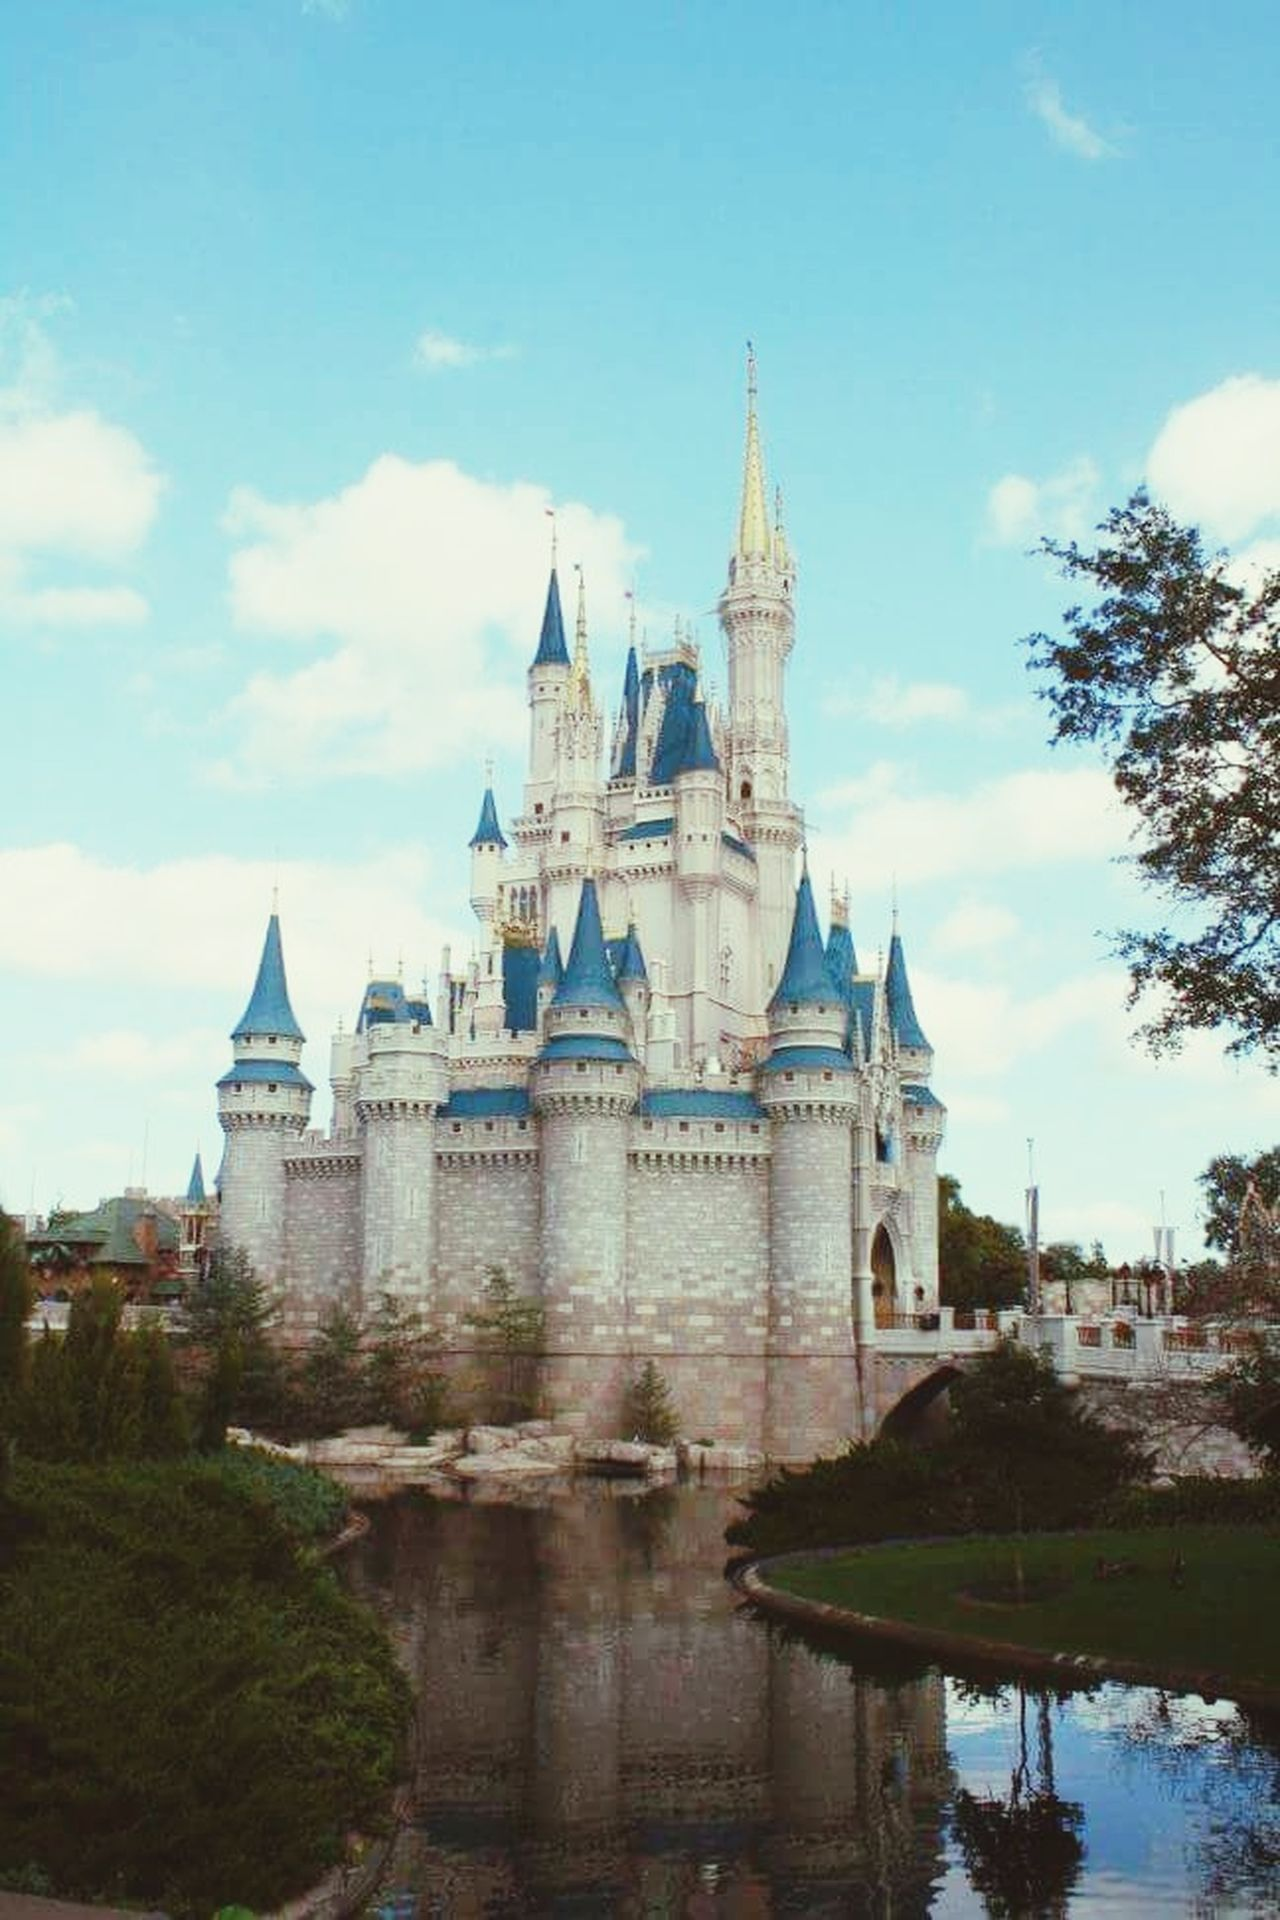 Disney Disneyland Cinderella Castle Architecture Magic Kingdom Magic Kindom Castle DisneyMagic  Disney Land Castle View  Magical Outdoors Waterfront Travel Destinations Architecture Landscape No People Water Tree Sky Landscape_Collection Landscape_photography Landmark Landmarks DisneyMagic